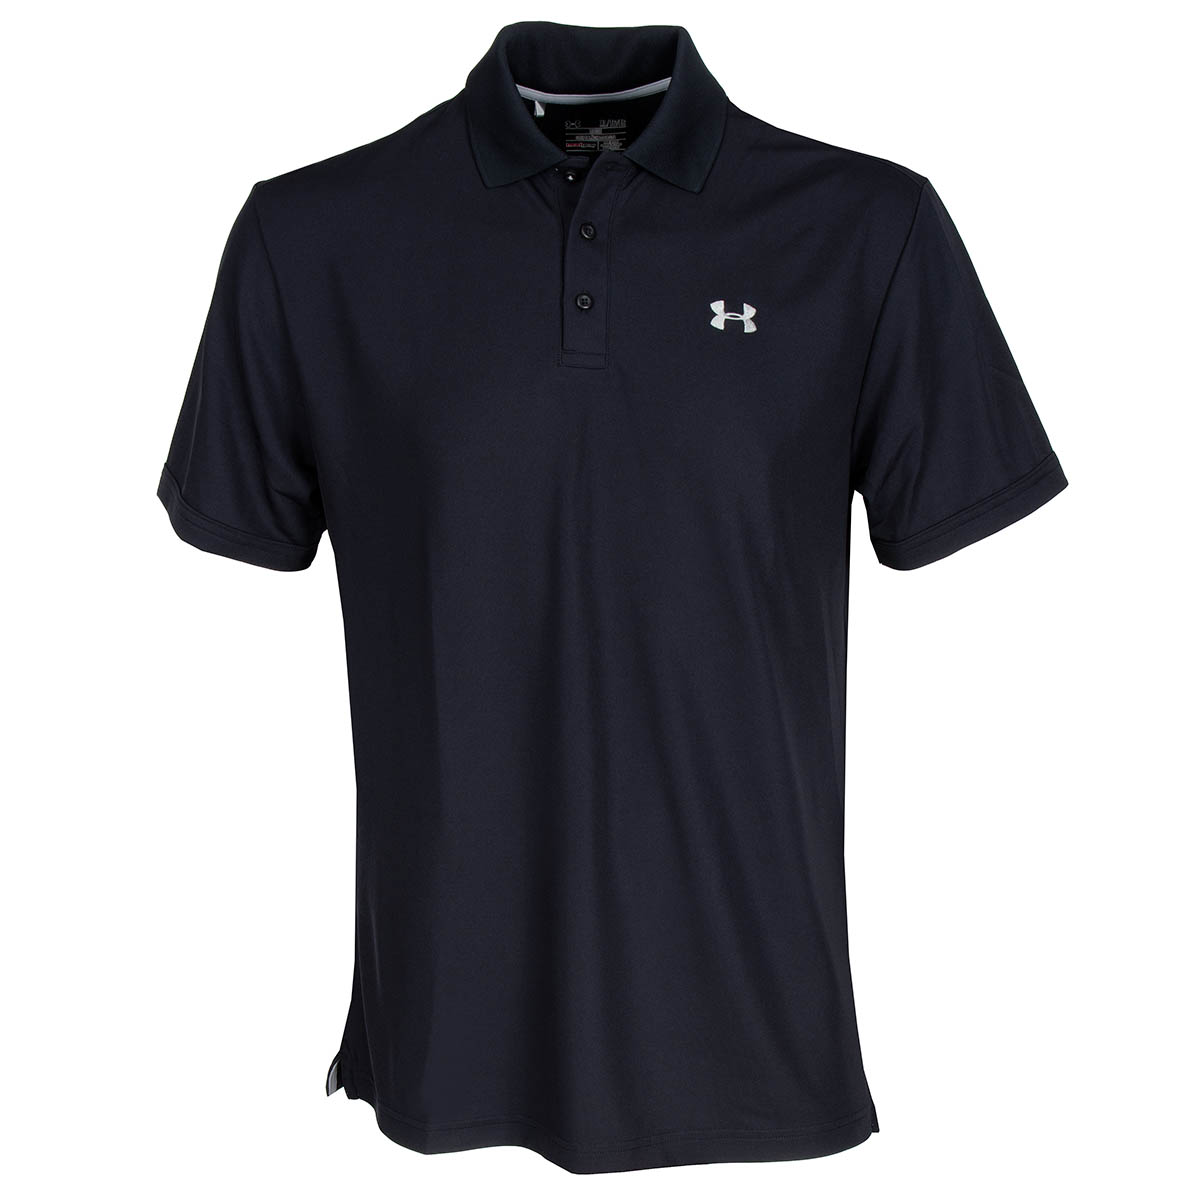 Under Armour Performance Polo Shirt Black Steel